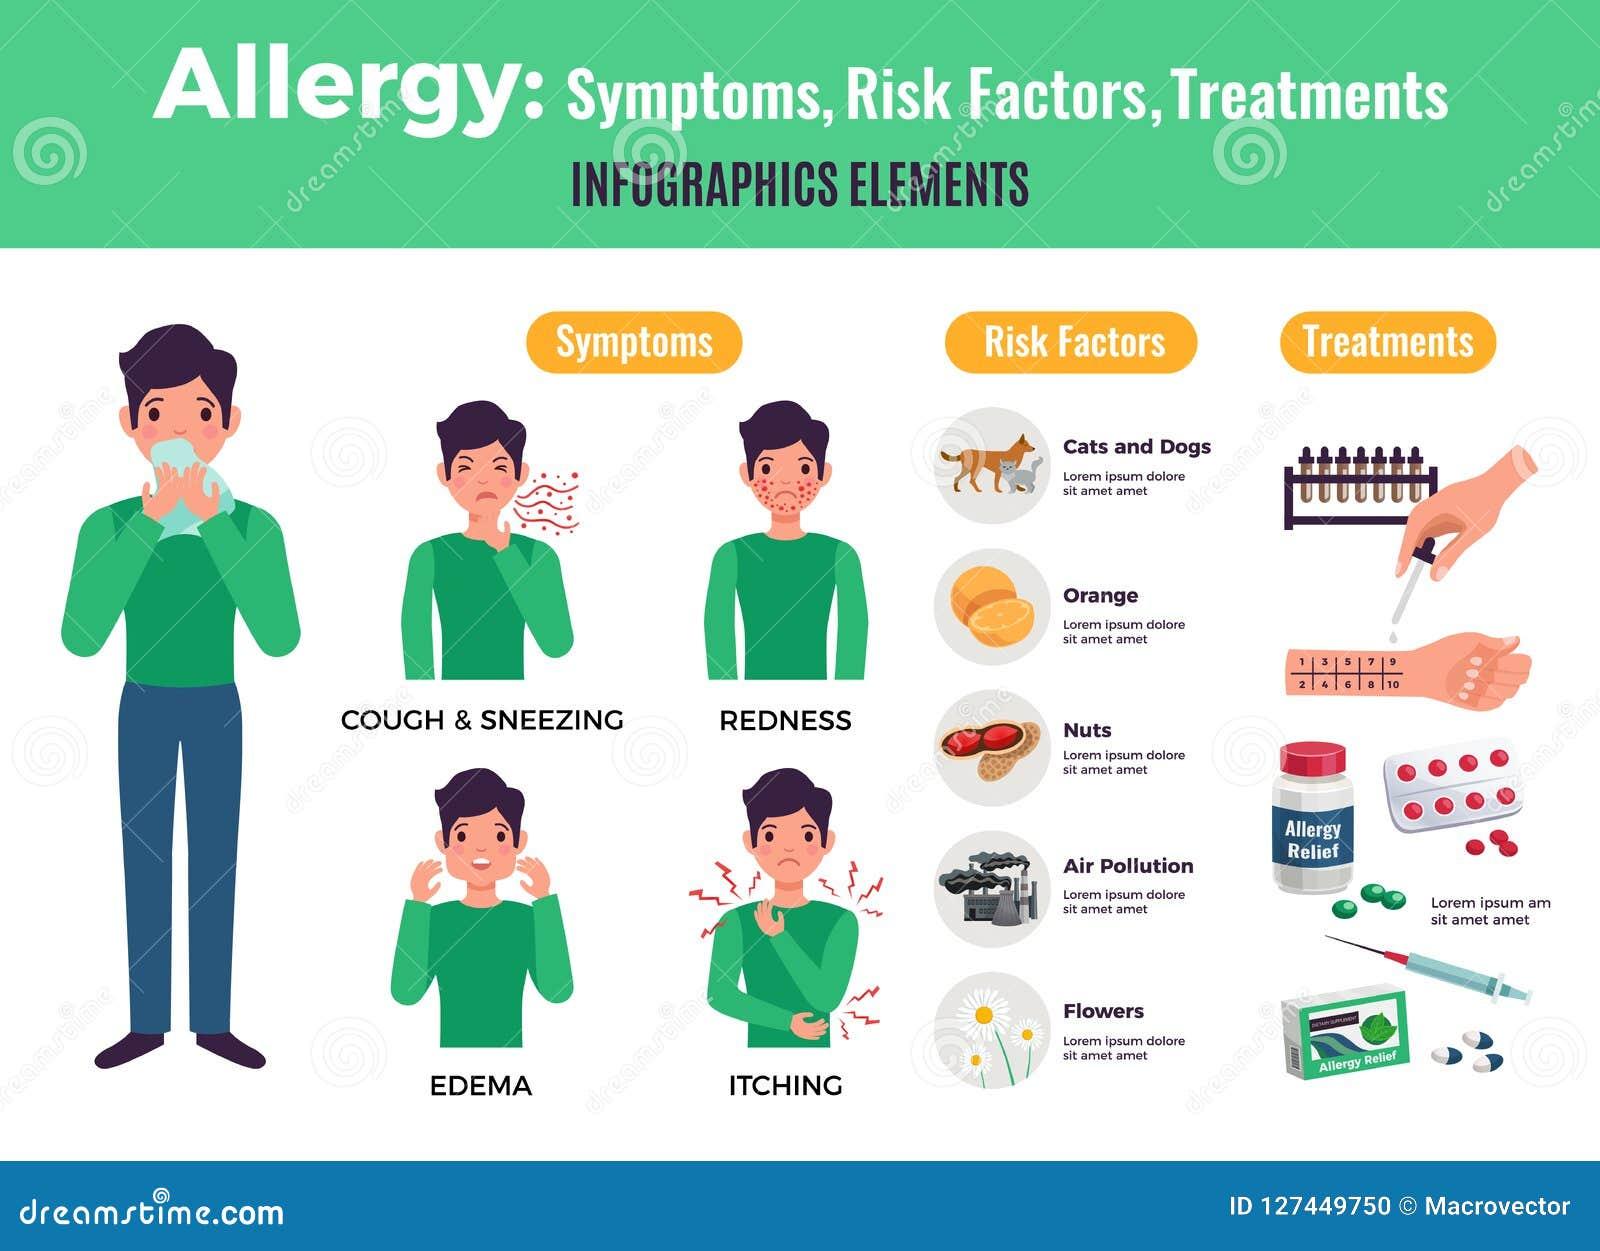 Allergy Infographic Elements Set